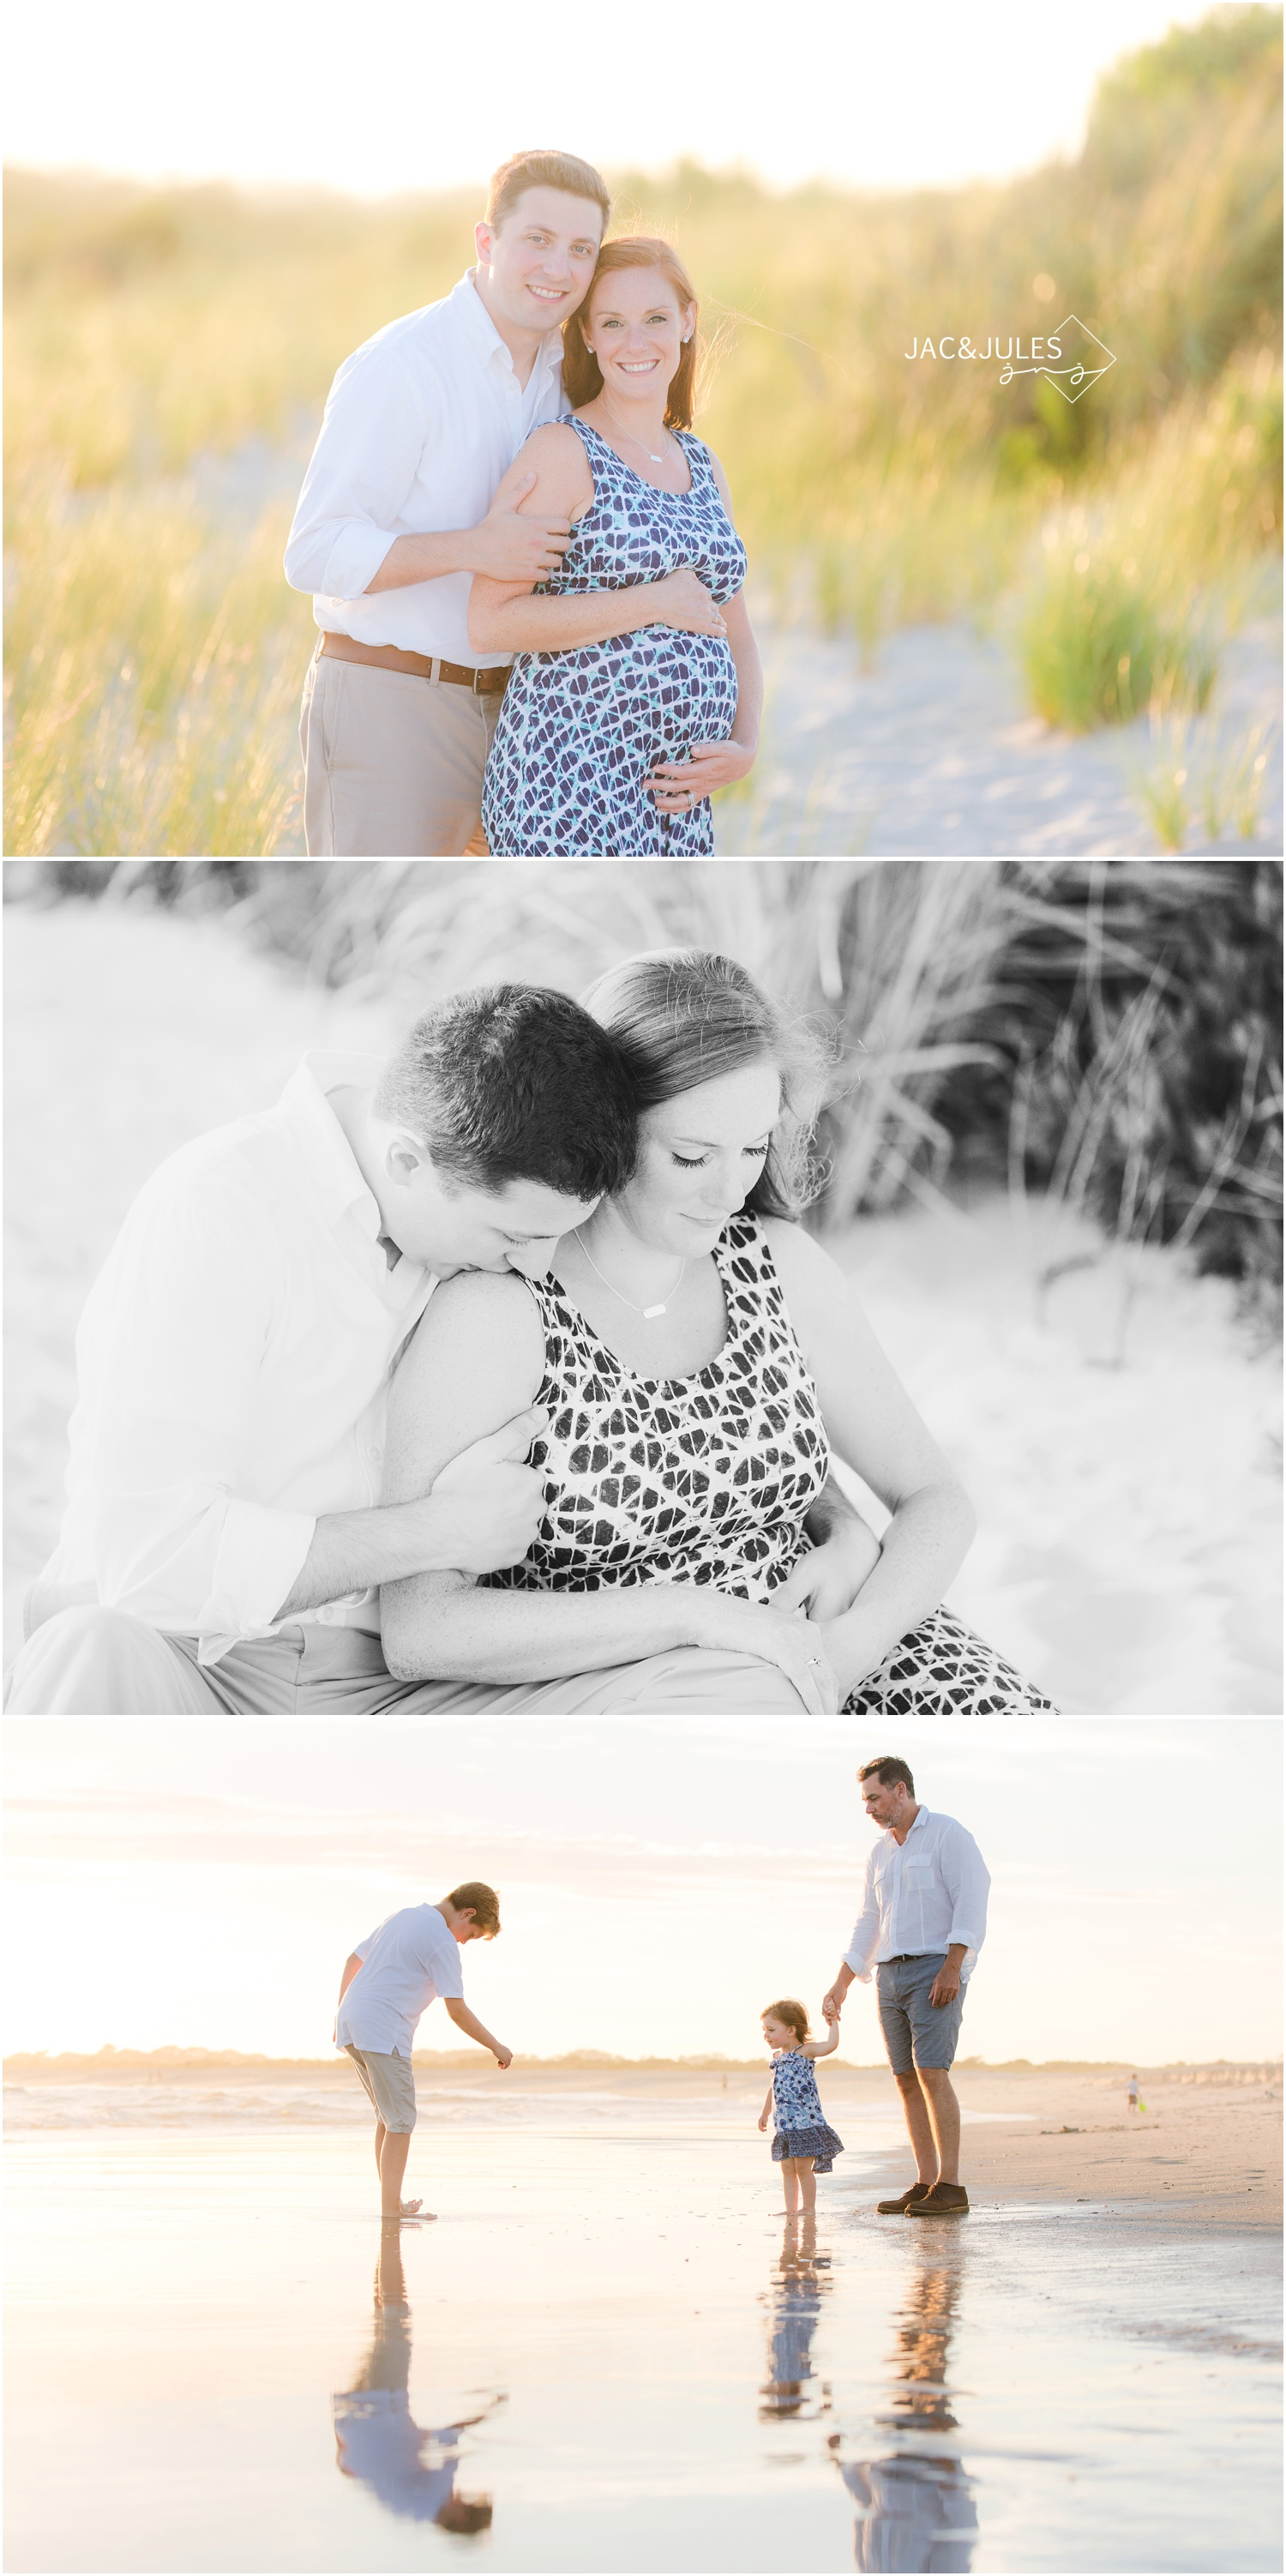 pretty beach maternity photos in cape may, nj